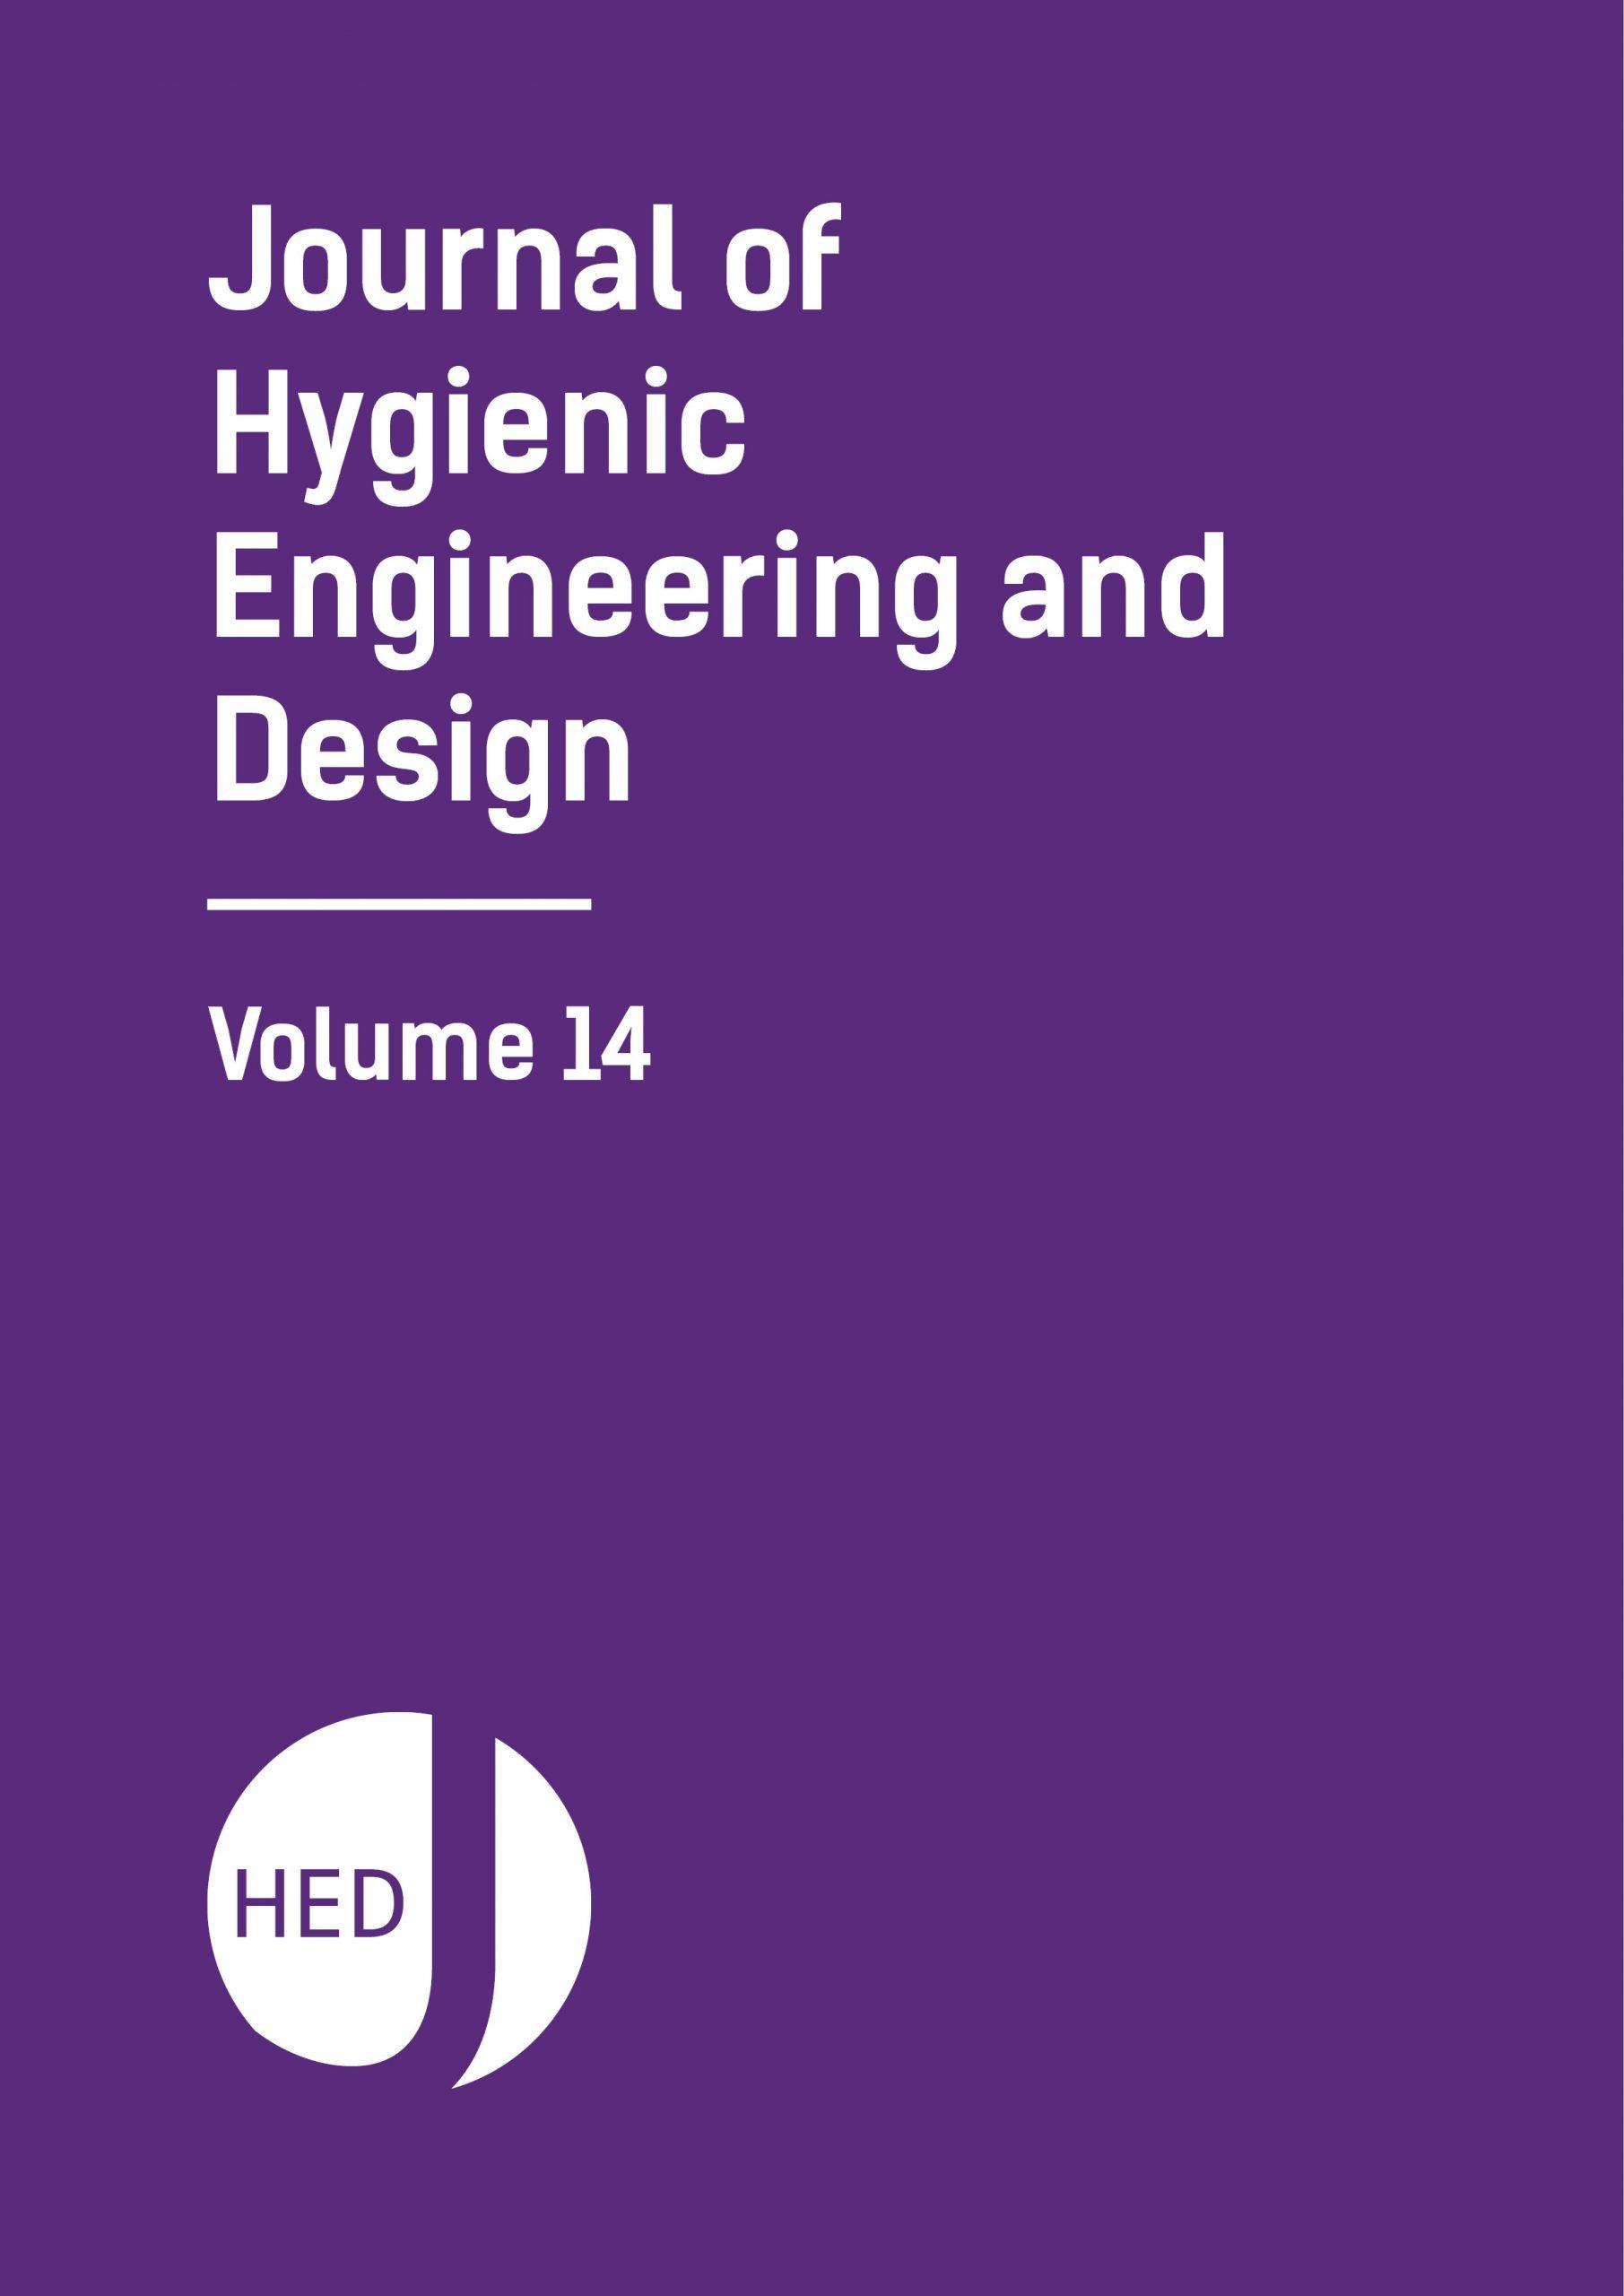 JHED Volume 14